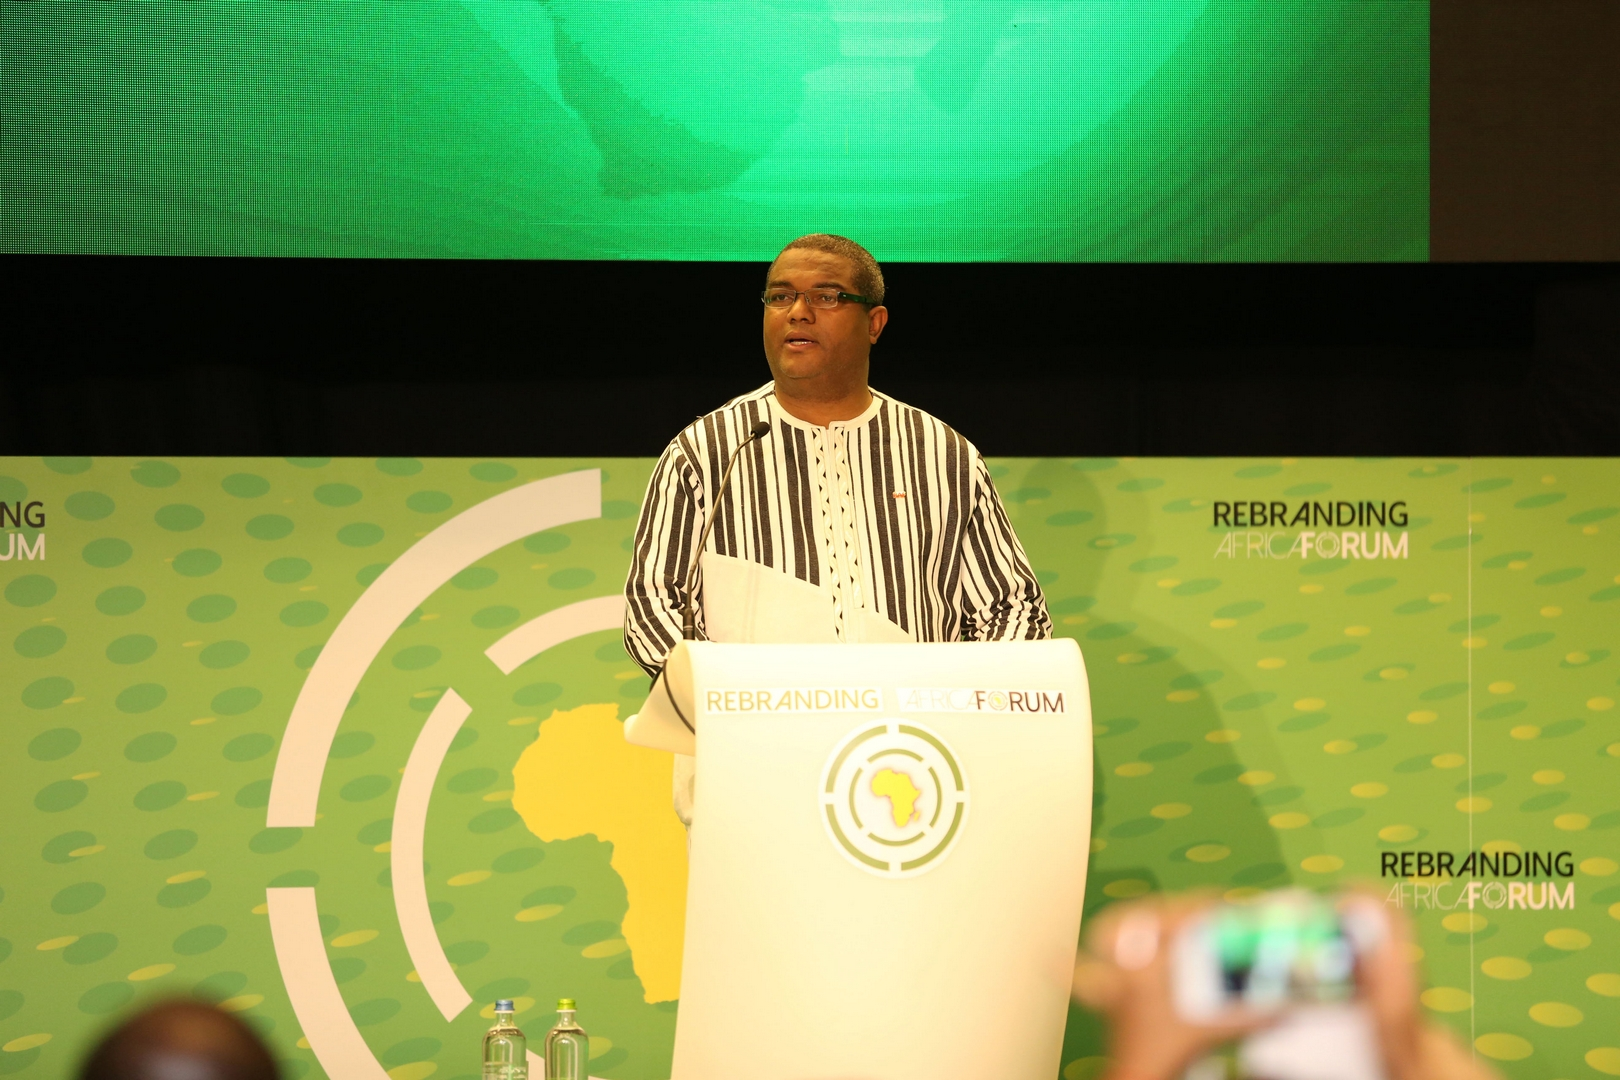 Thierry Hot, Fondateur, Rebranding Africa Forum / Founder, Rebranding Africa Forum